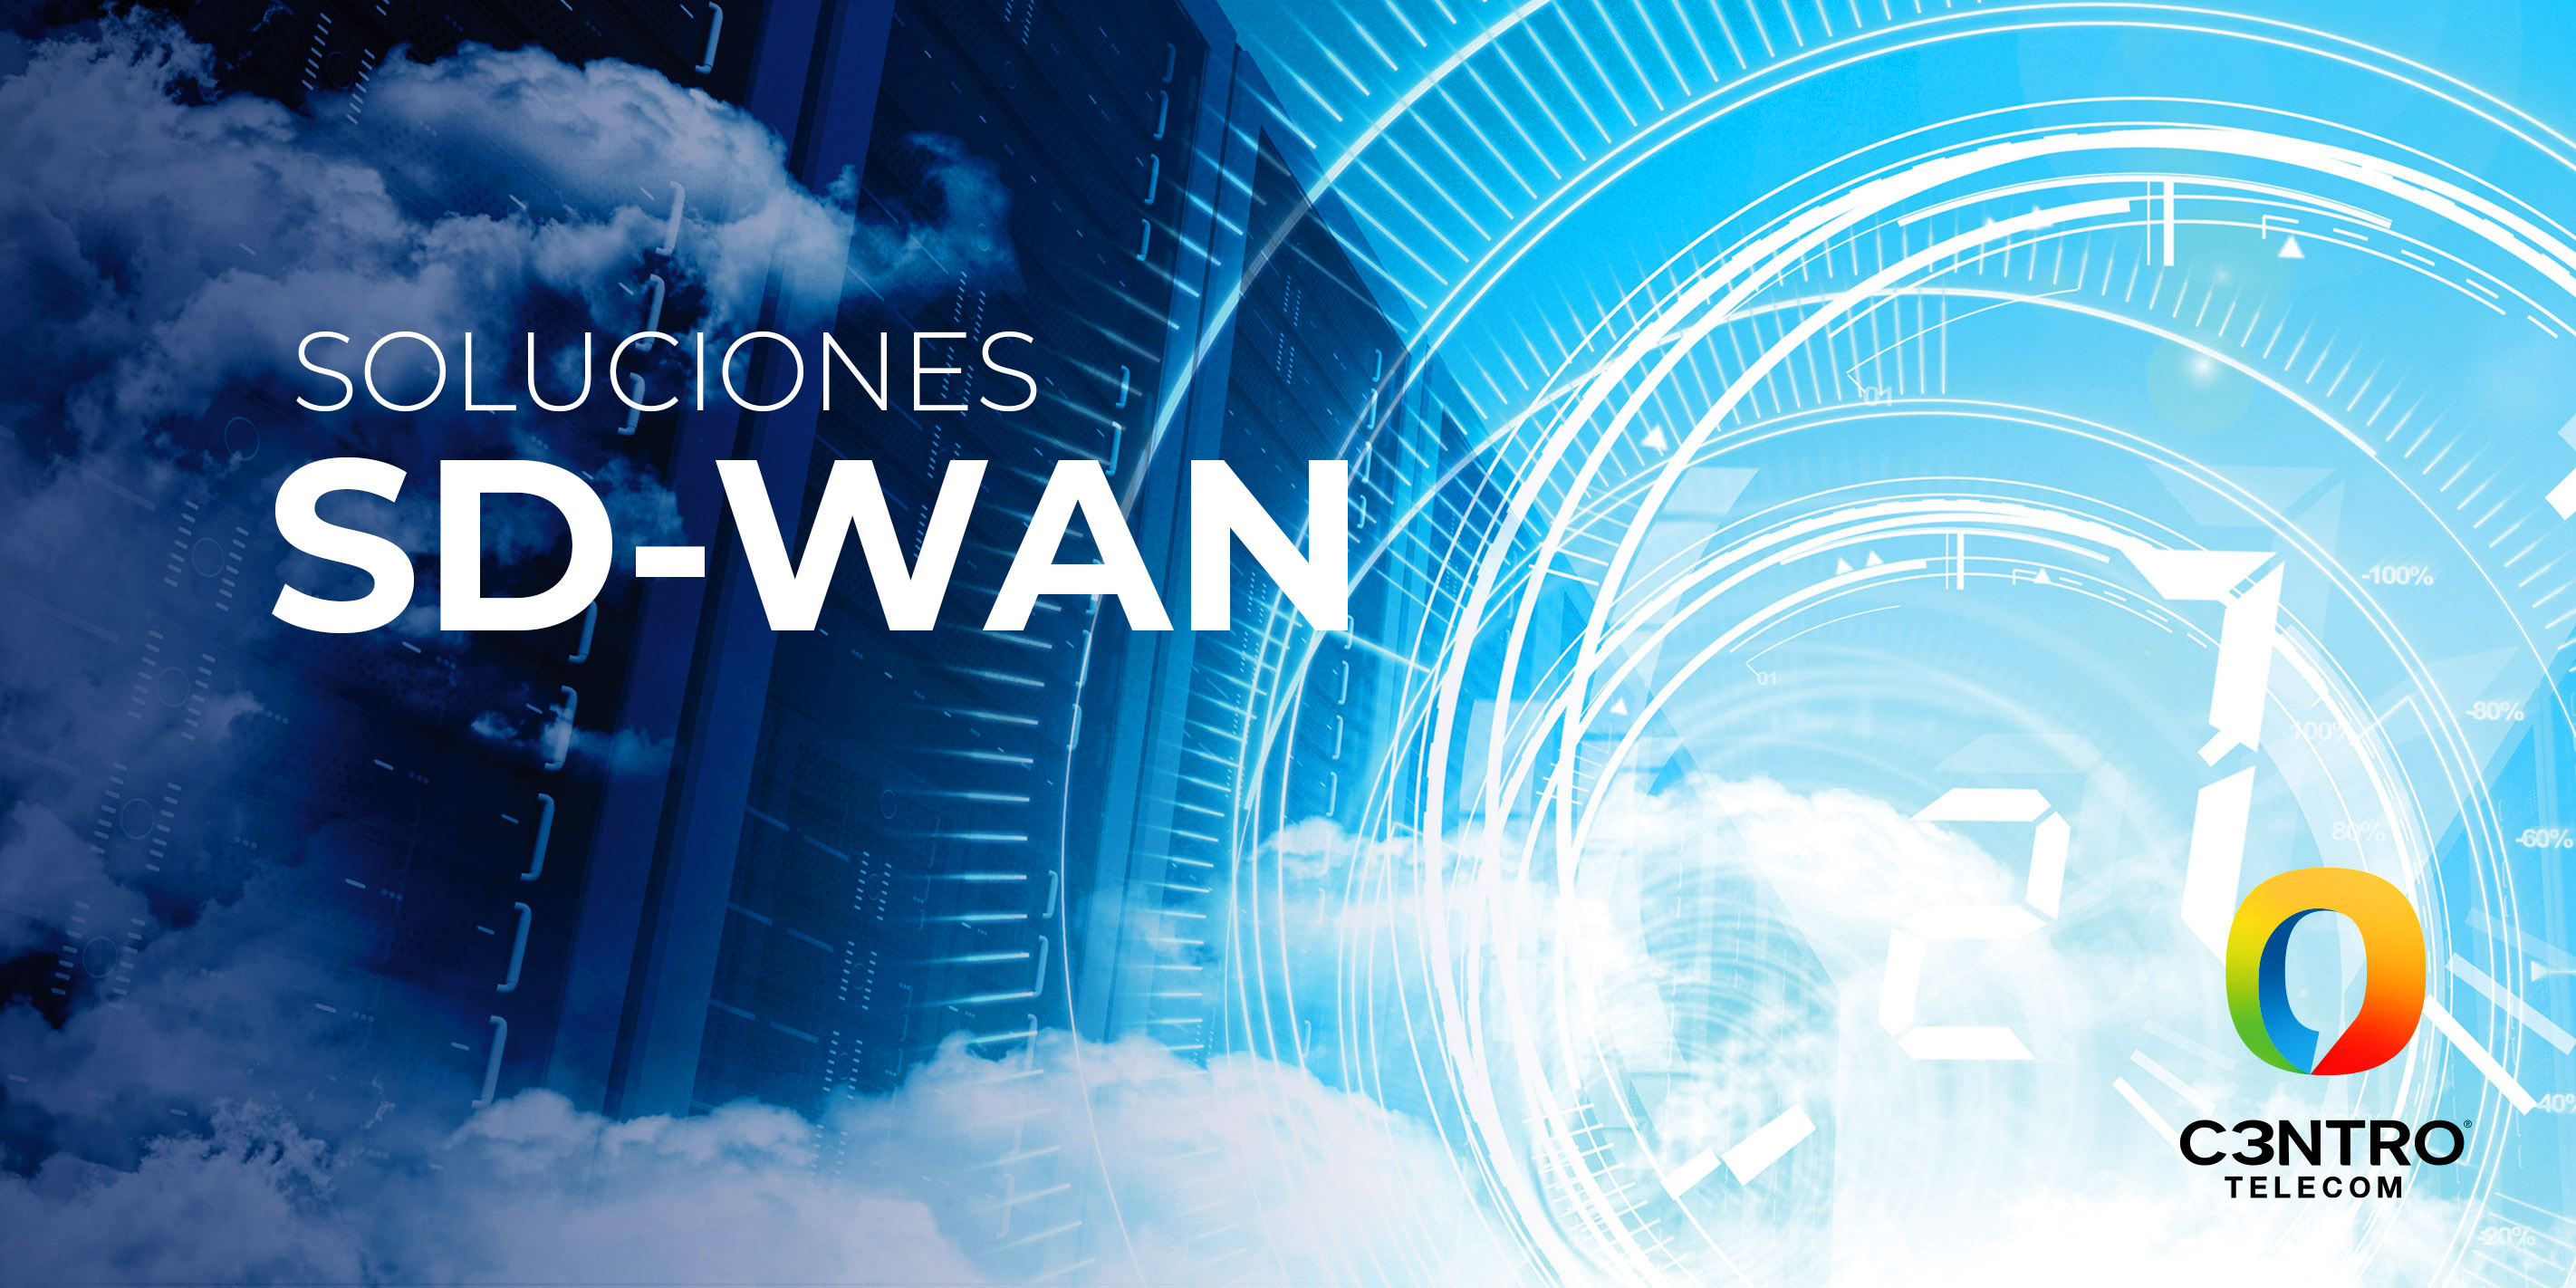 soluciones de SDWAN C3ntro telecom